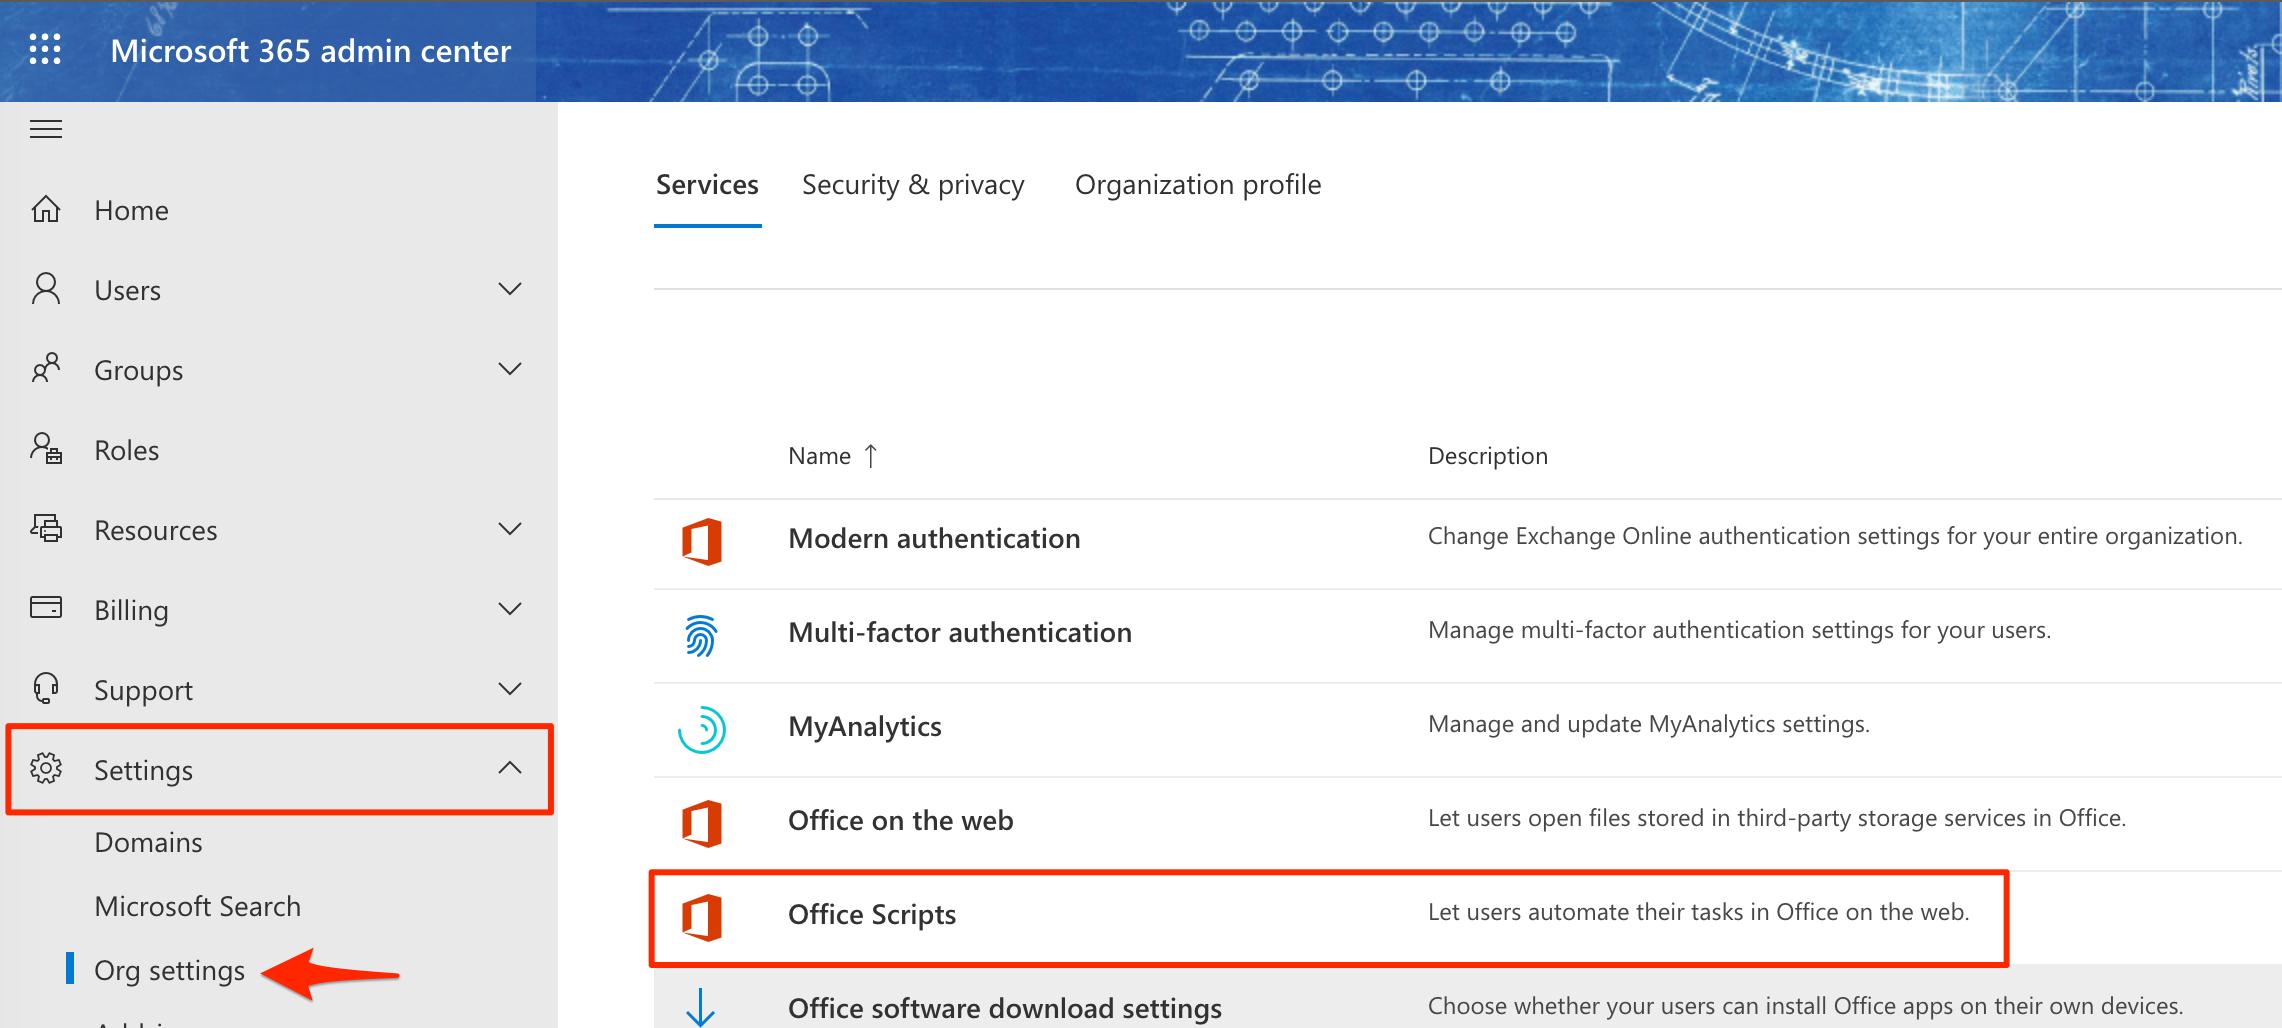 Office Scripts settings